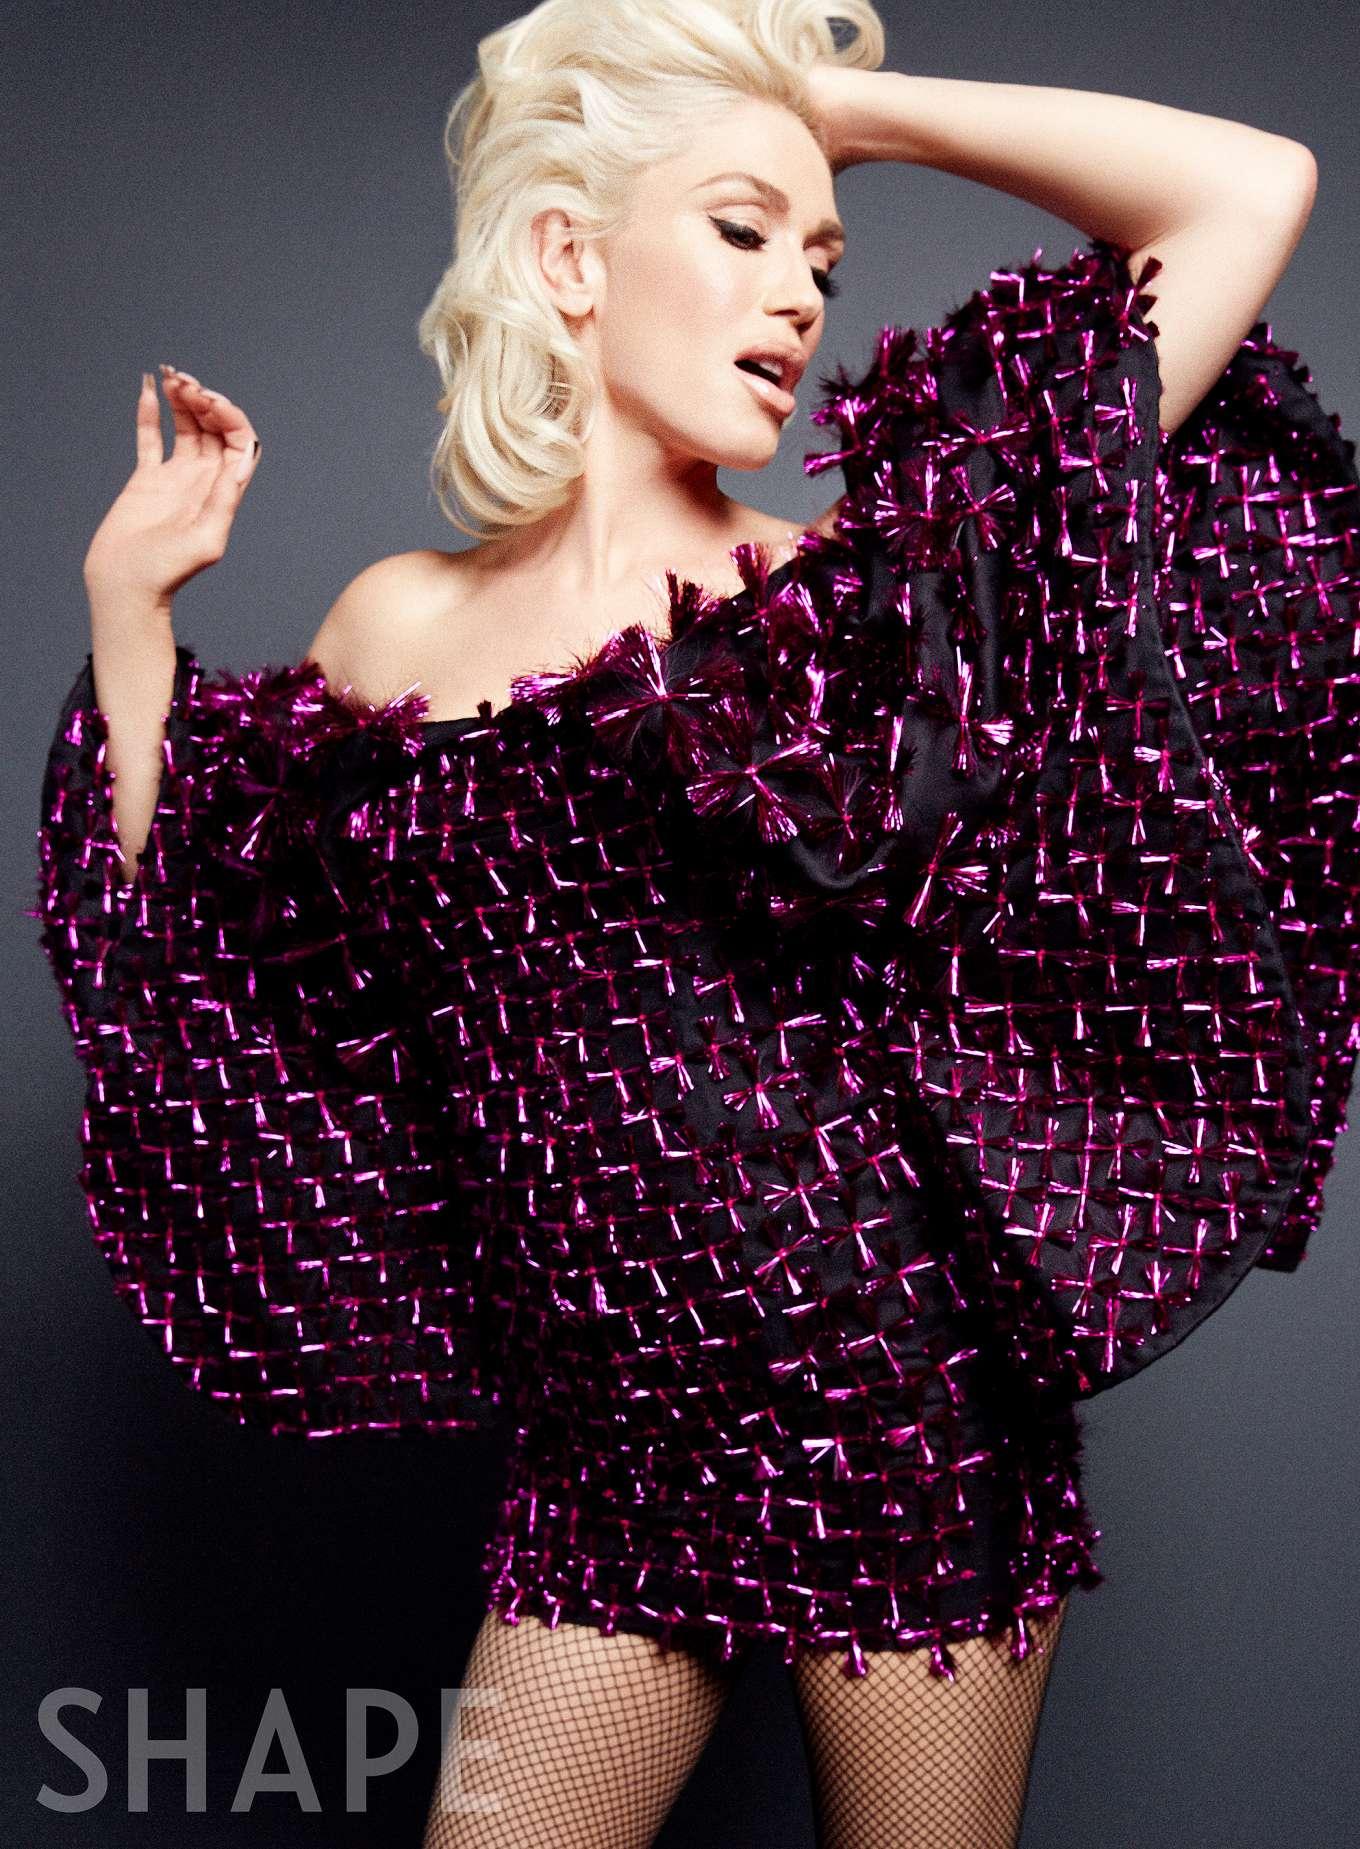 Gwen Stefani - Shape US Magazine (November 2019)